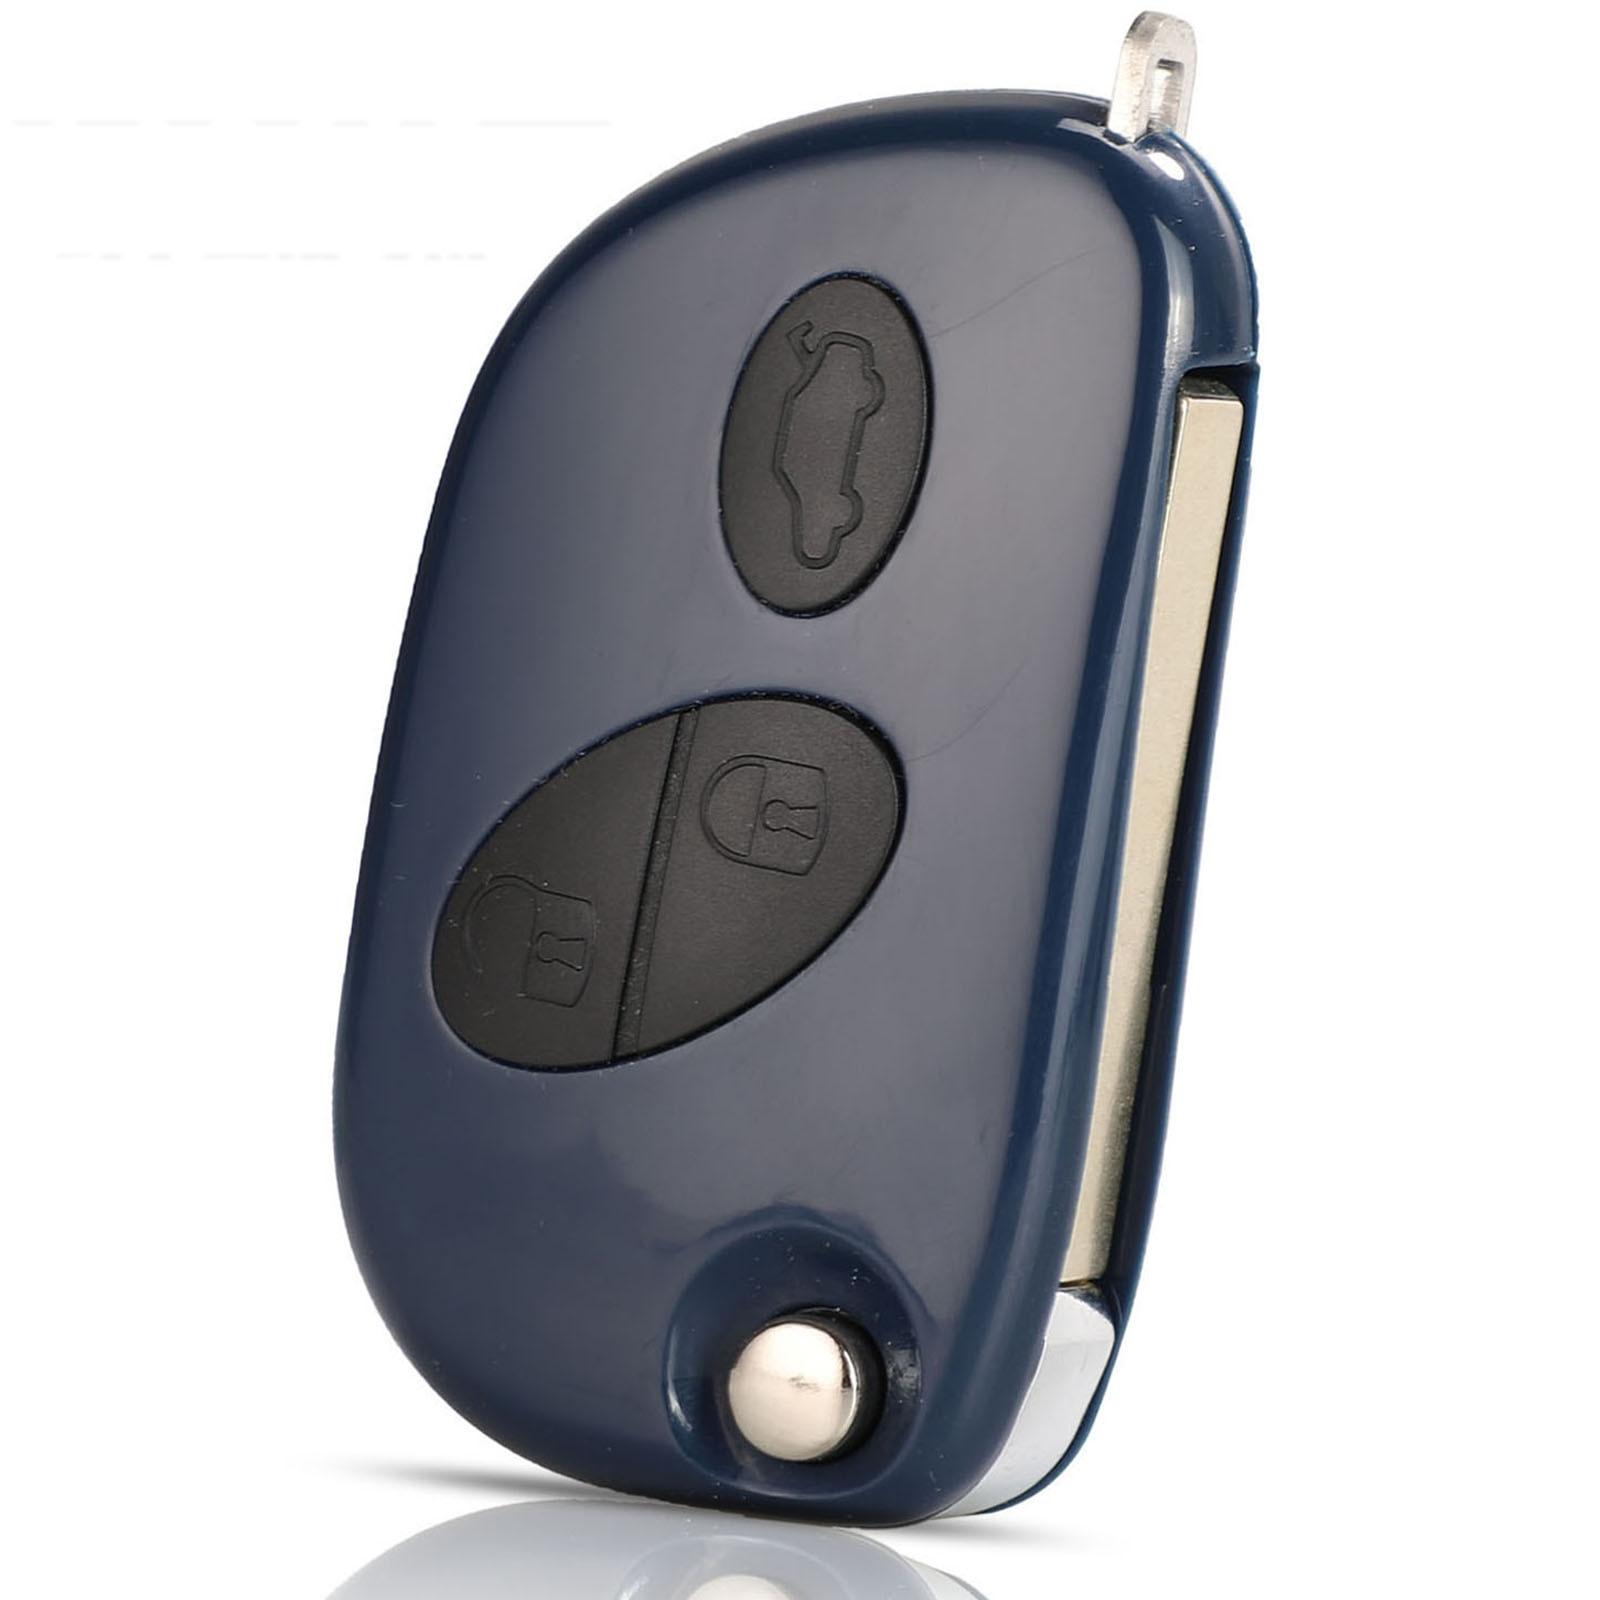 Kutery 3 кнопки Замена дистанционного ключа автомобиля чехол Fob для Maserati GRAN TURISMO QUATTROPORTE Uncut Blade